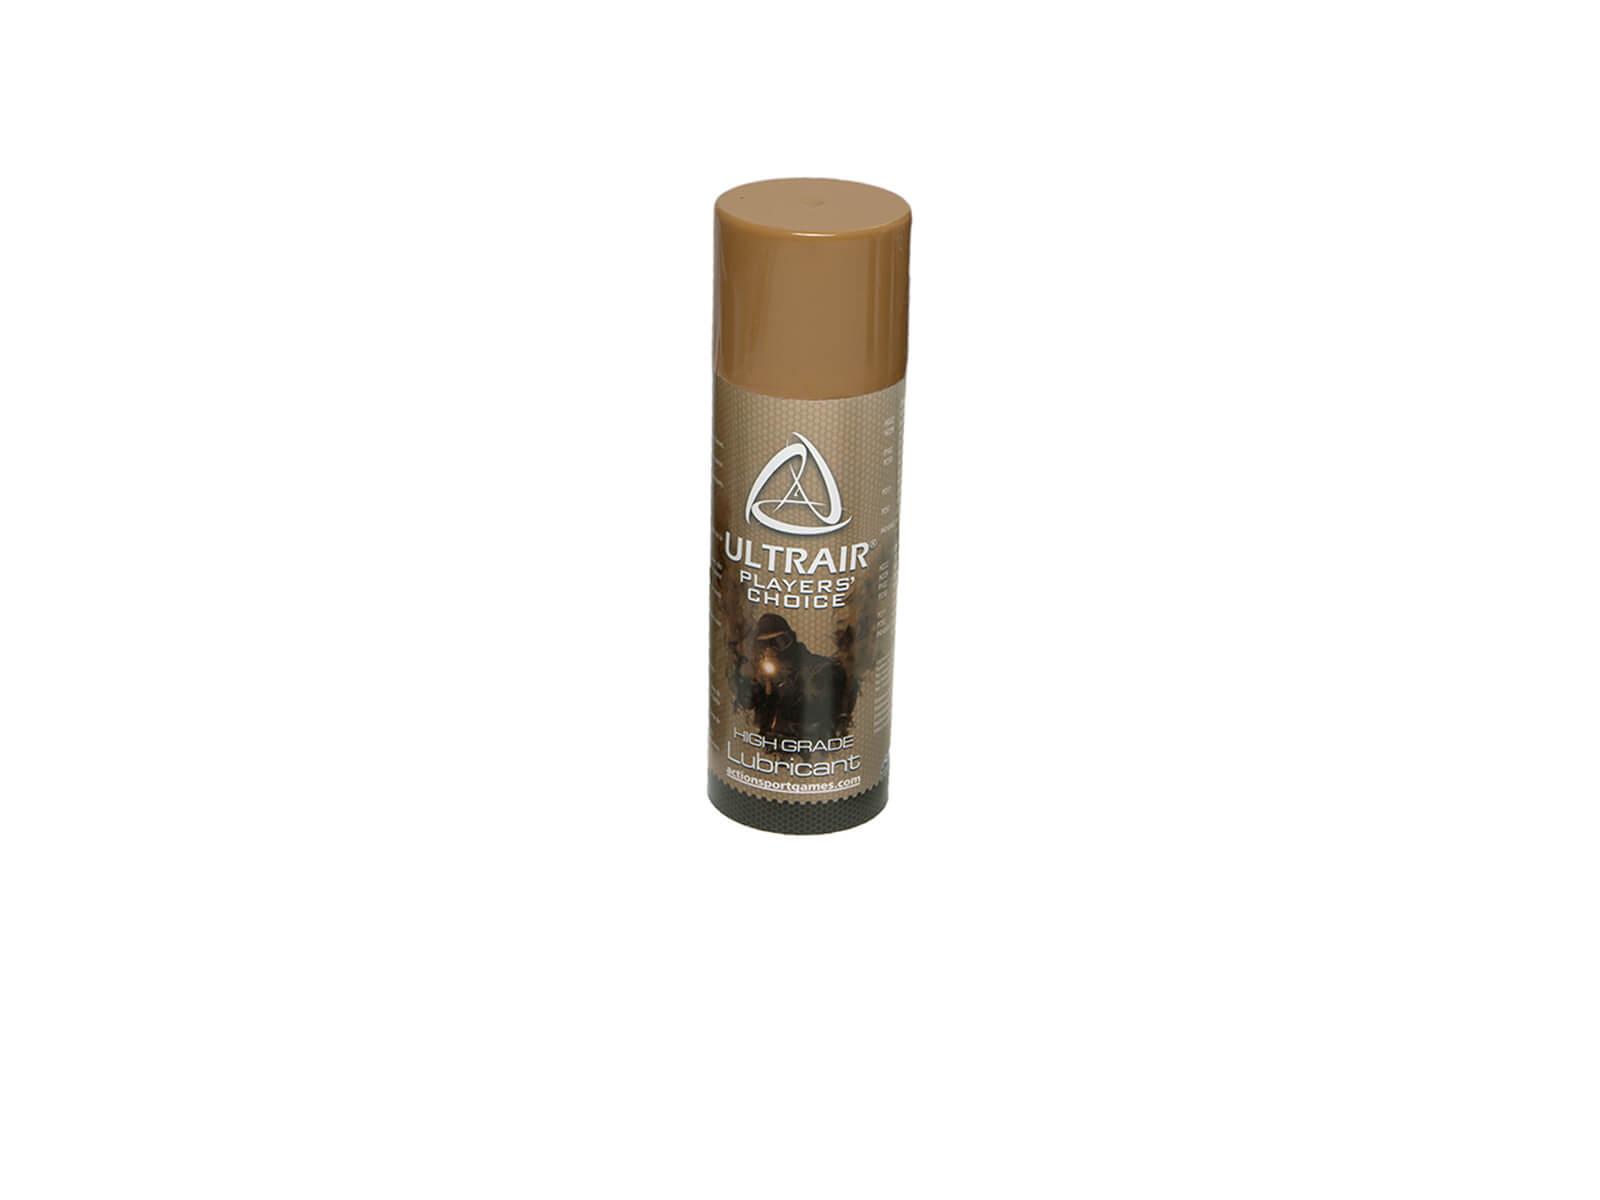 Image of ASG Ultrair Silikoneolie, 220 ml